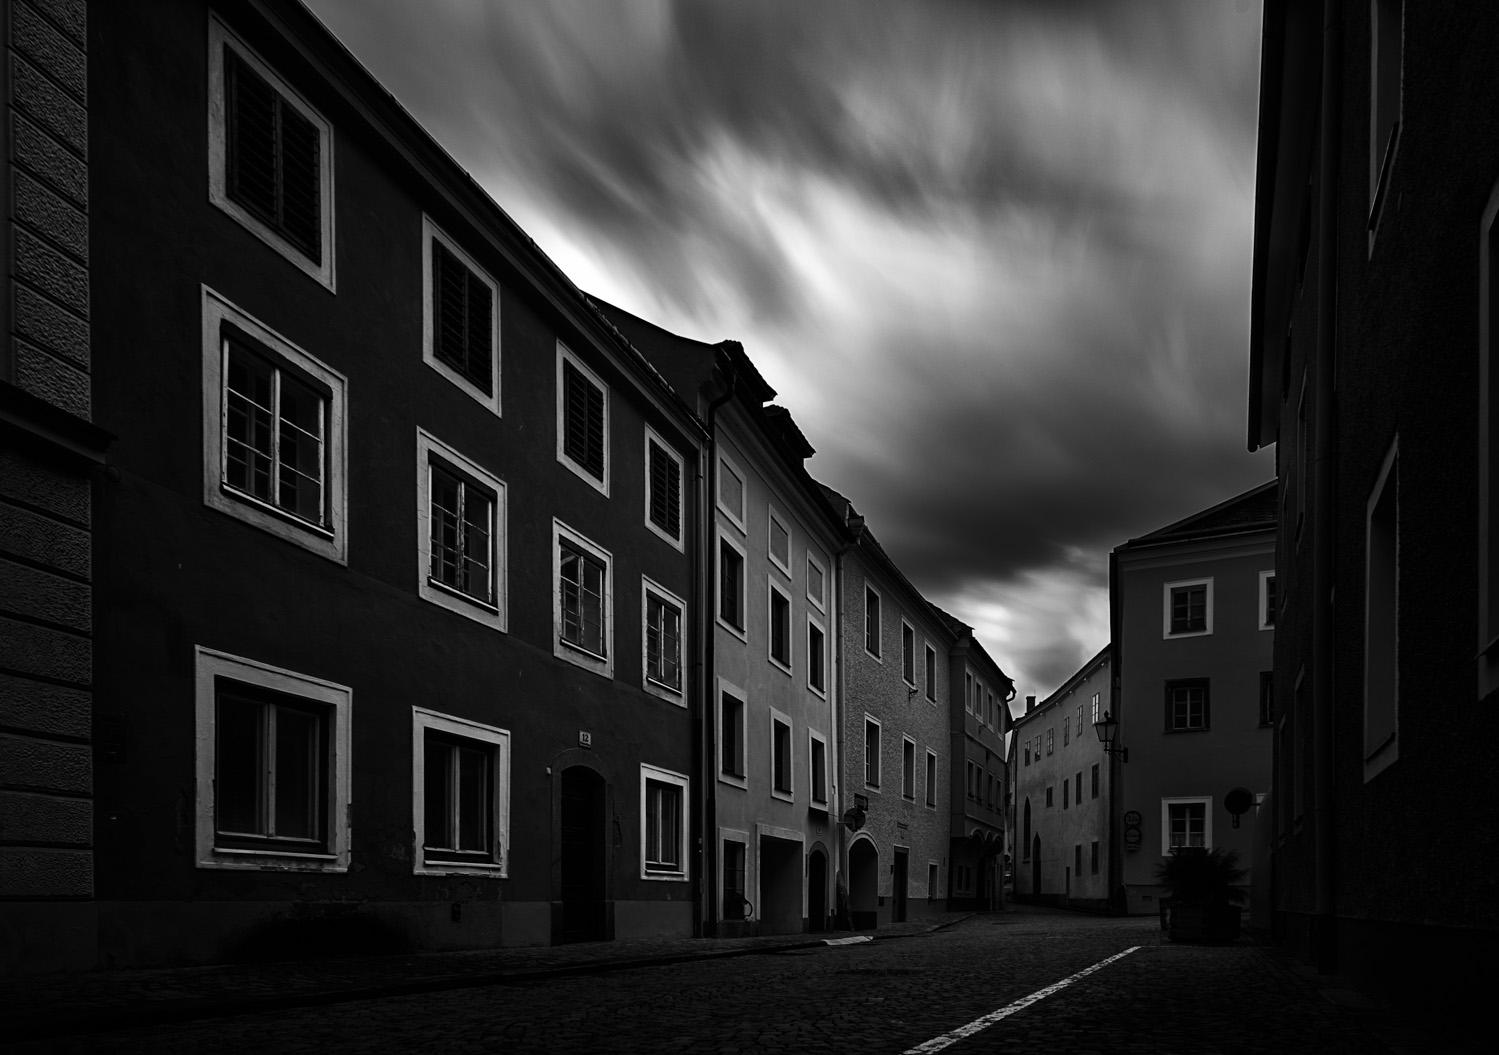 Freistadt, Upper Austria